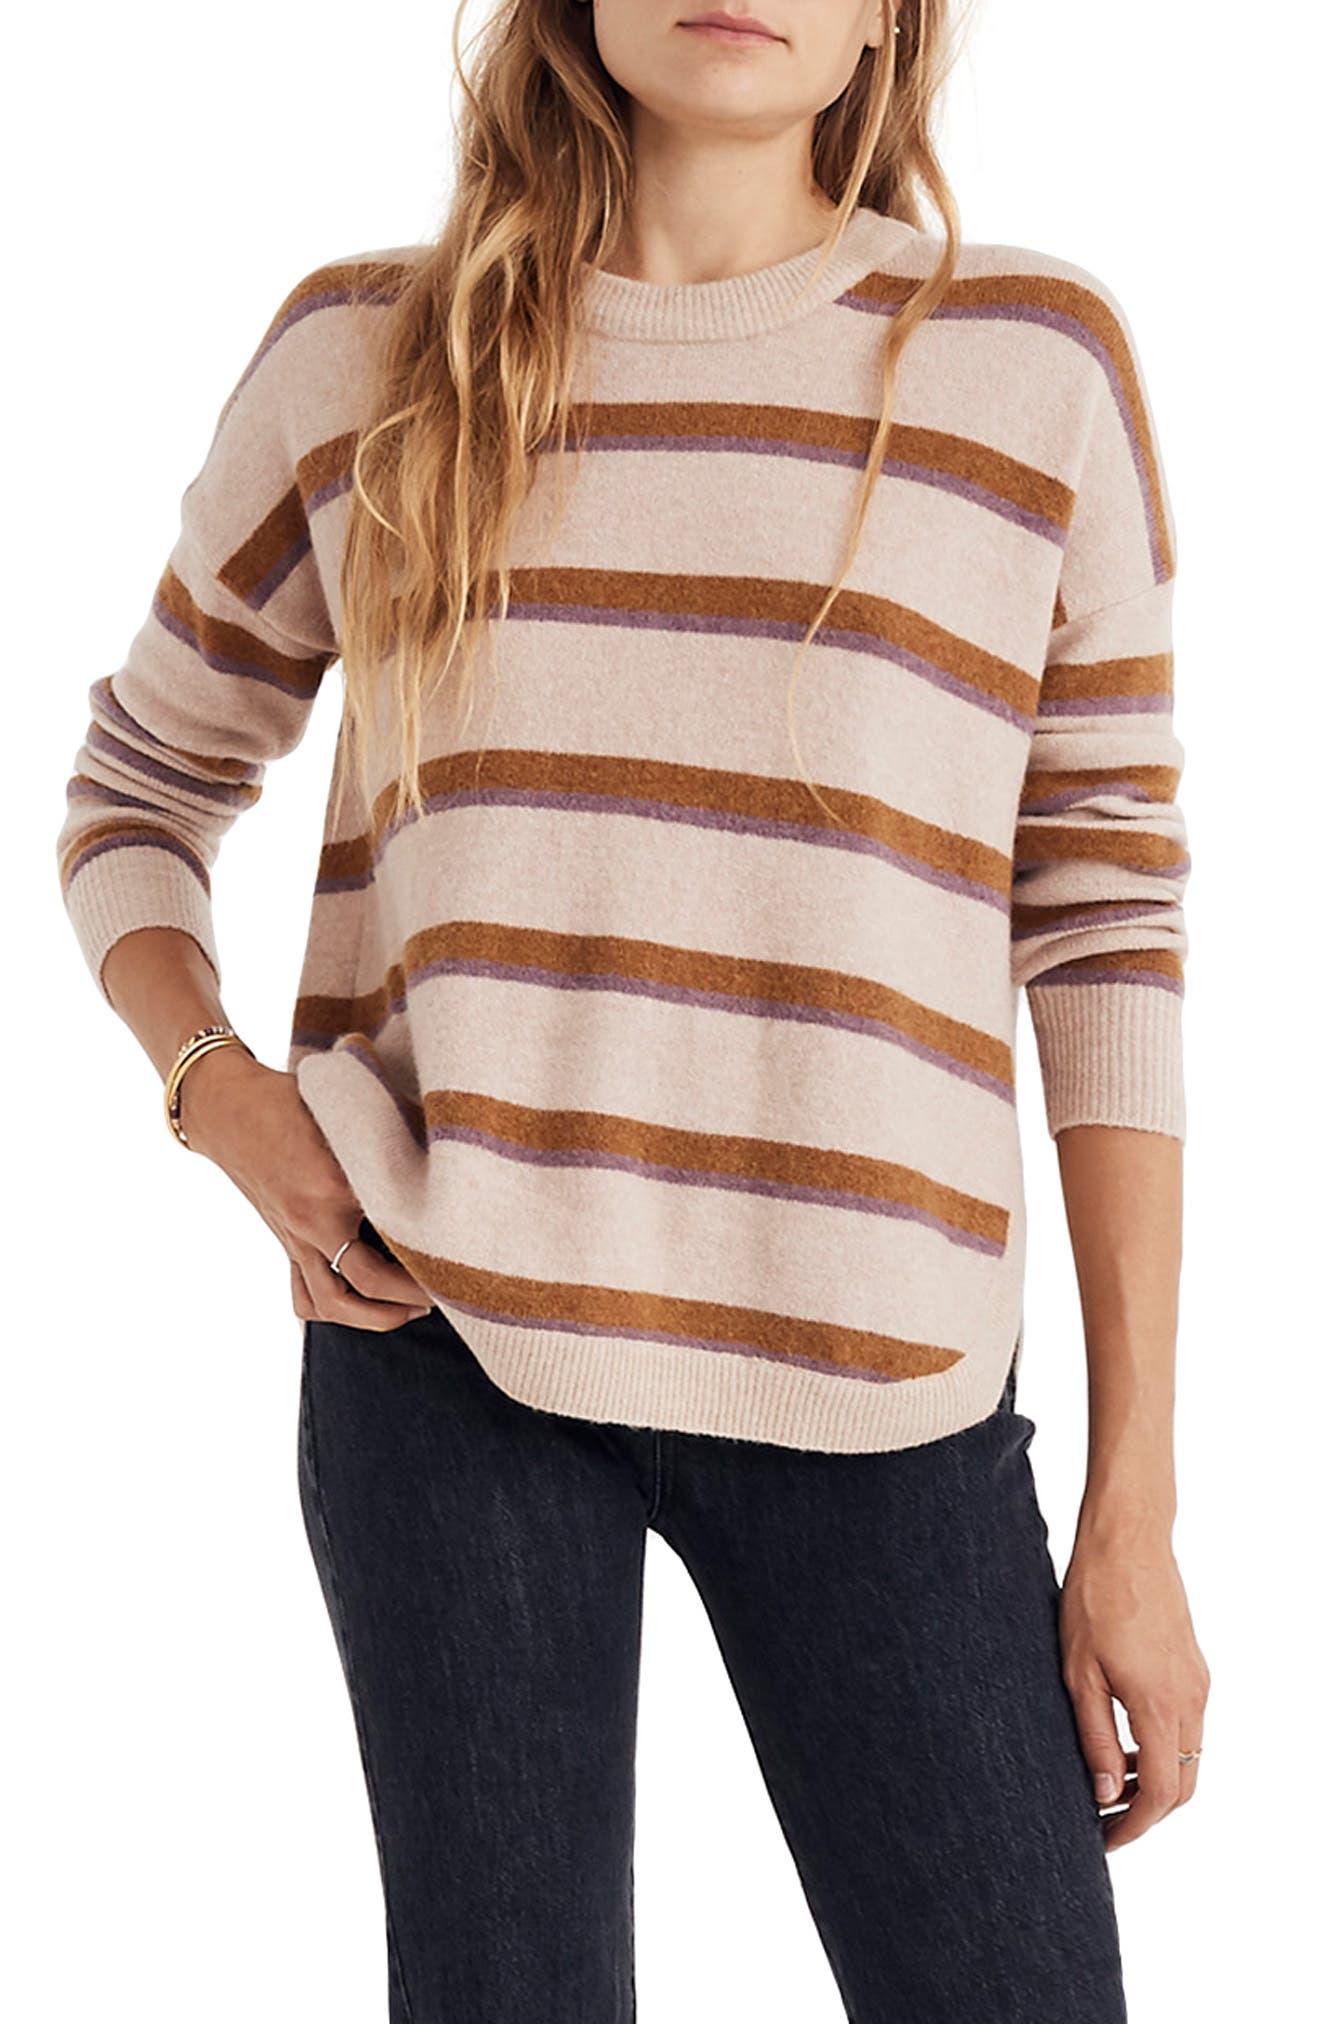 Westlake regular Striped Sweater Pullover Yarn Size In Coziest Madewell amp; Plus 7wZBq7